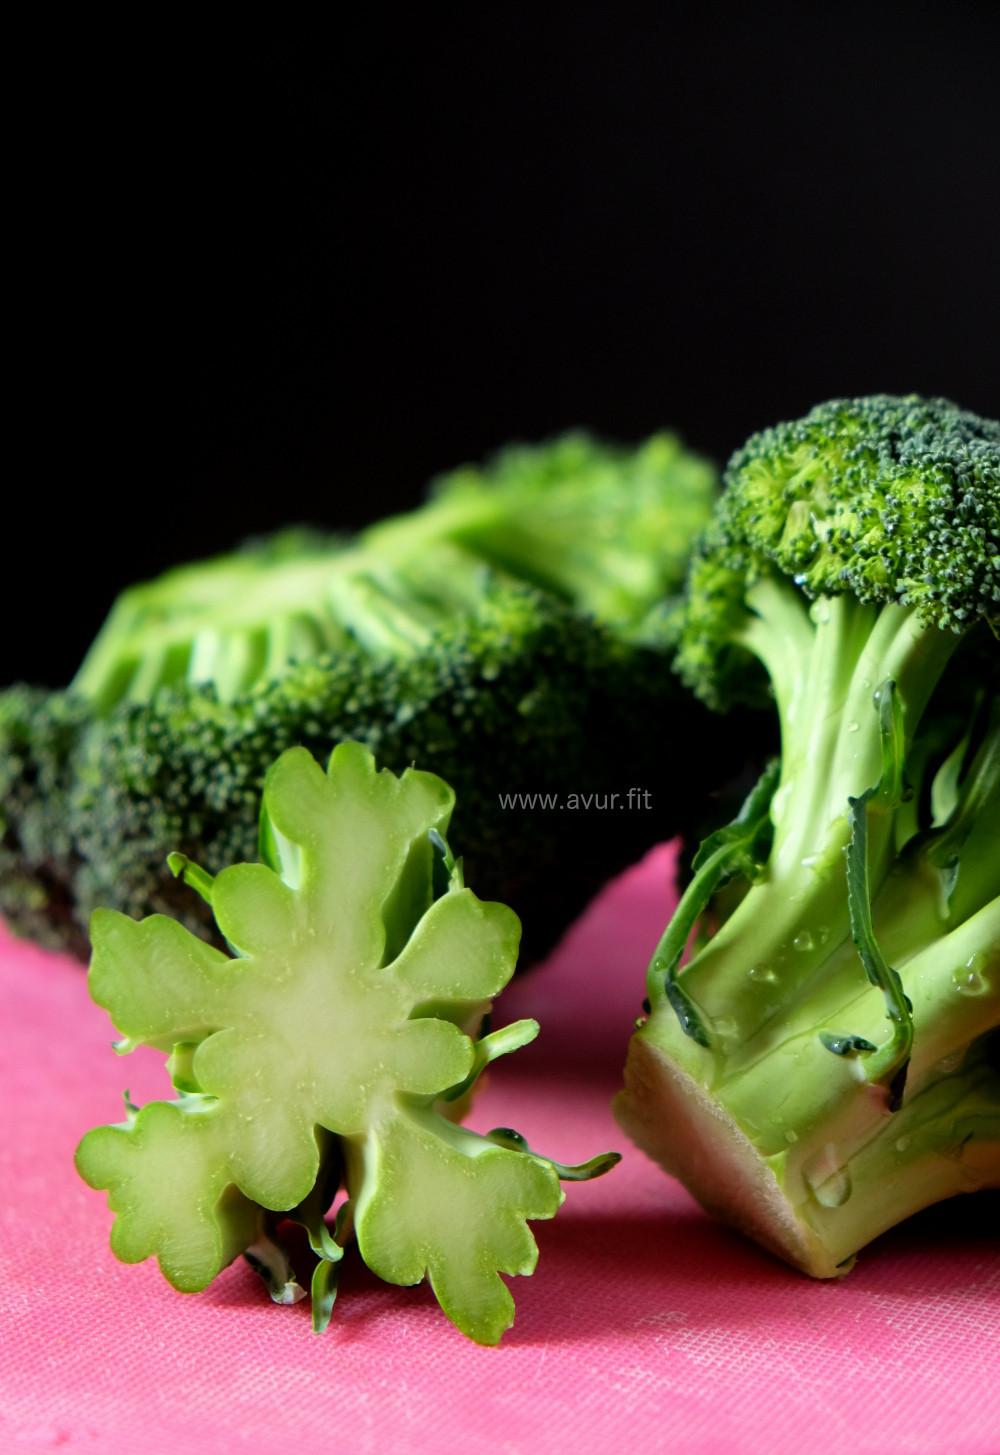 Broccoli Cross-Section